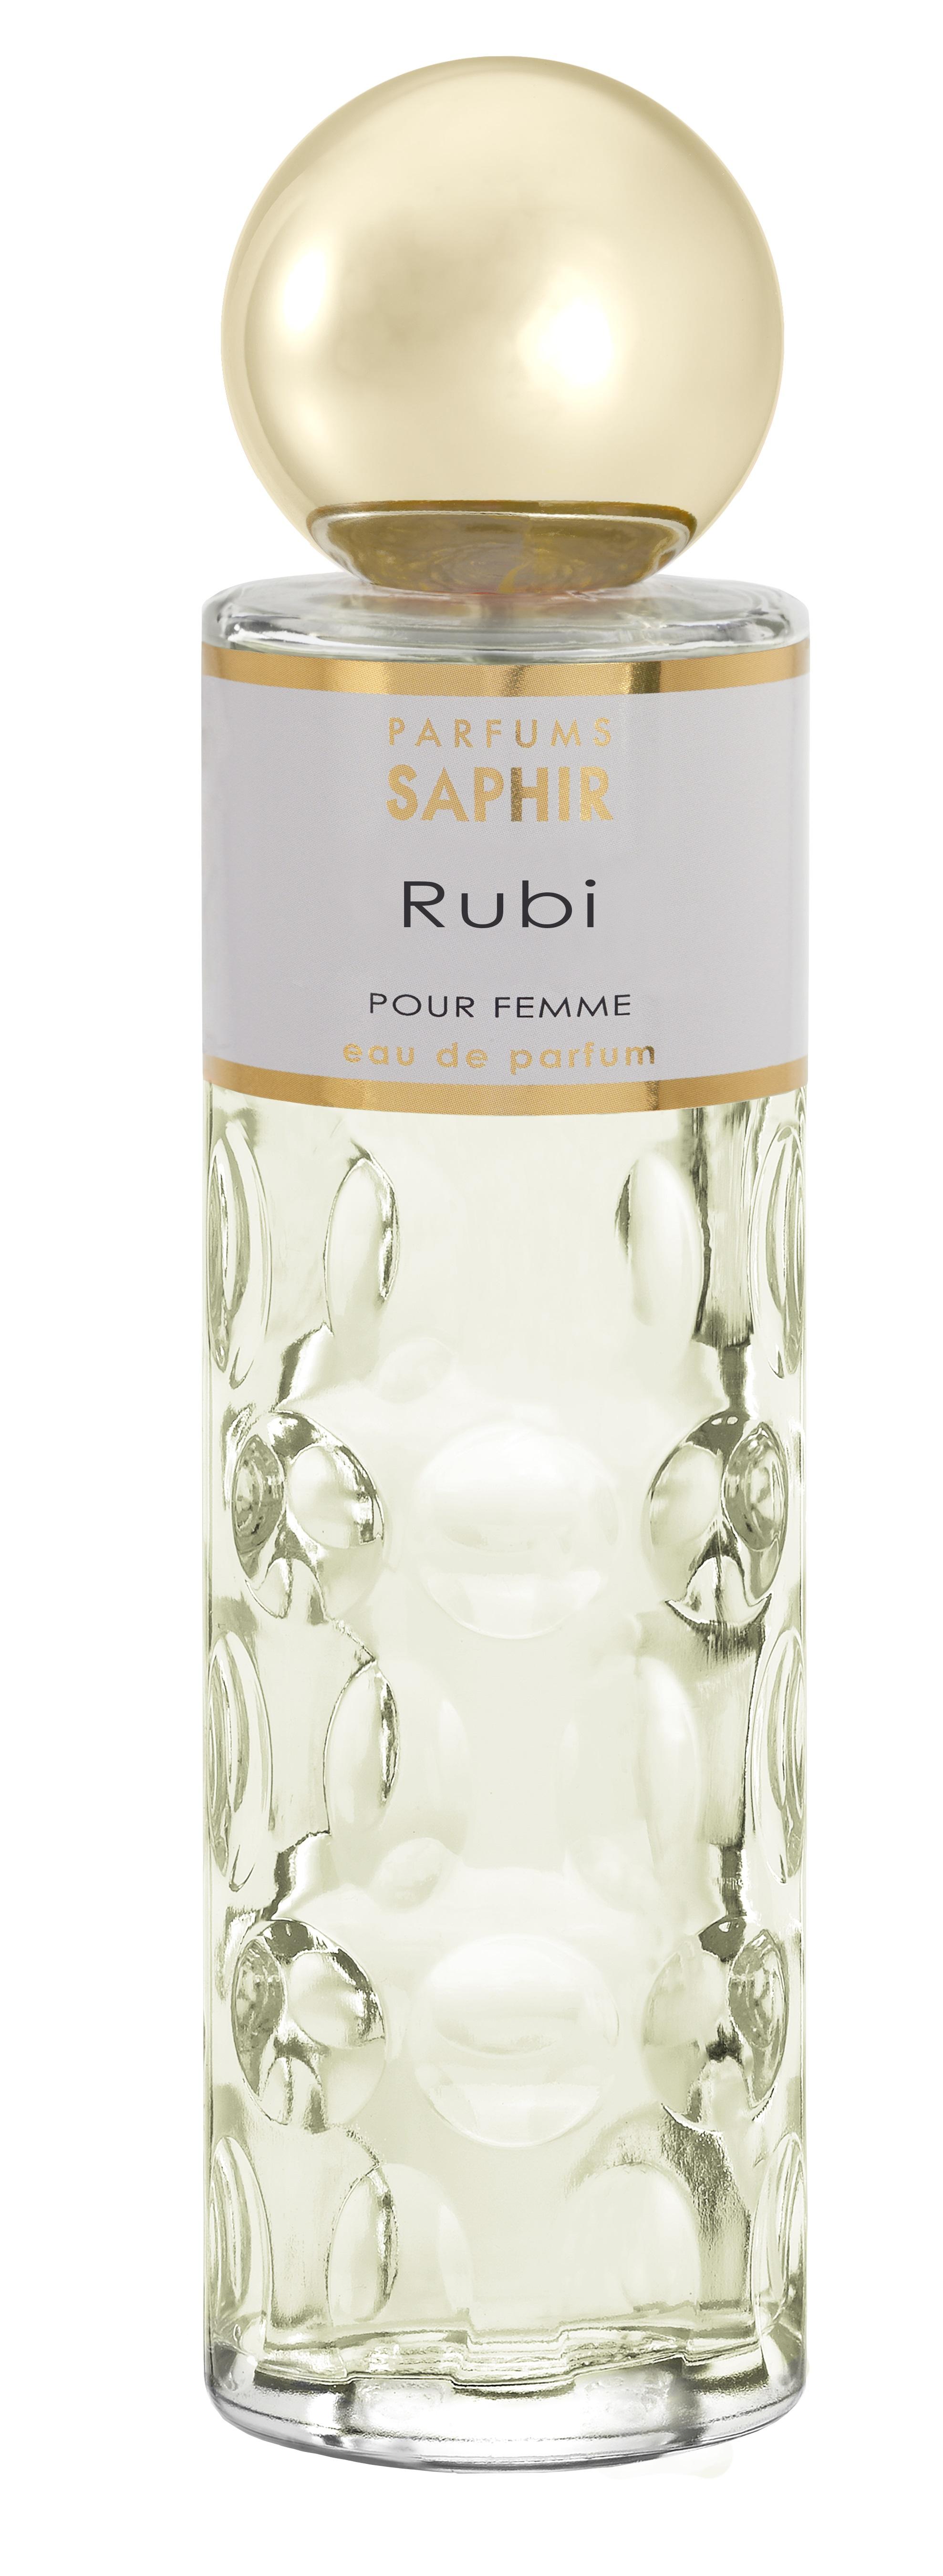 Saphir Rubi  Eau de Parfum 200 ml